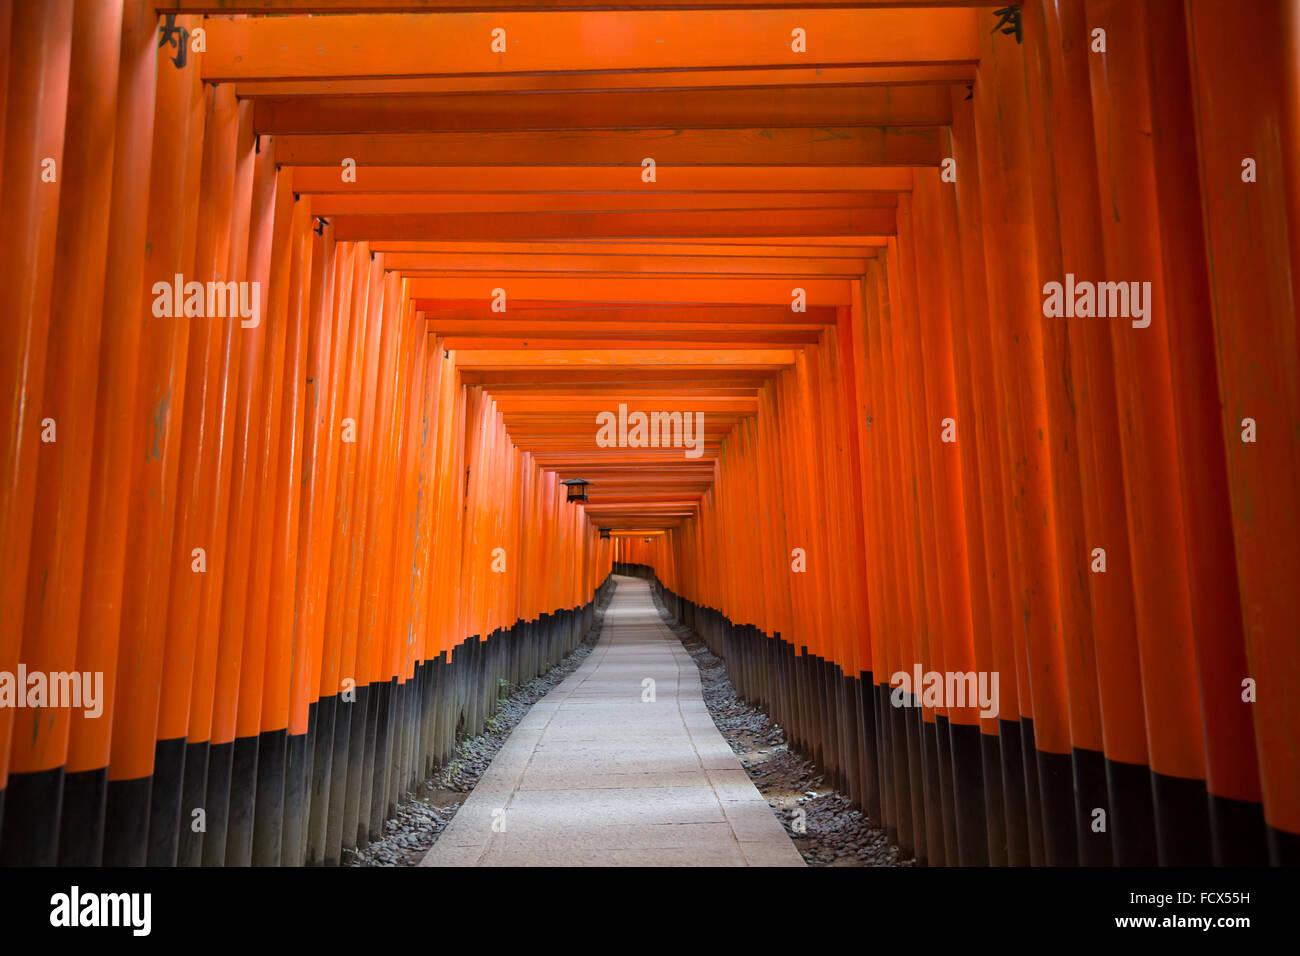 Japanischen Shinto-Tempel in Kyoto - Fushimi Inari Schrein (Fushimi Inari-Taisha) Stockbild